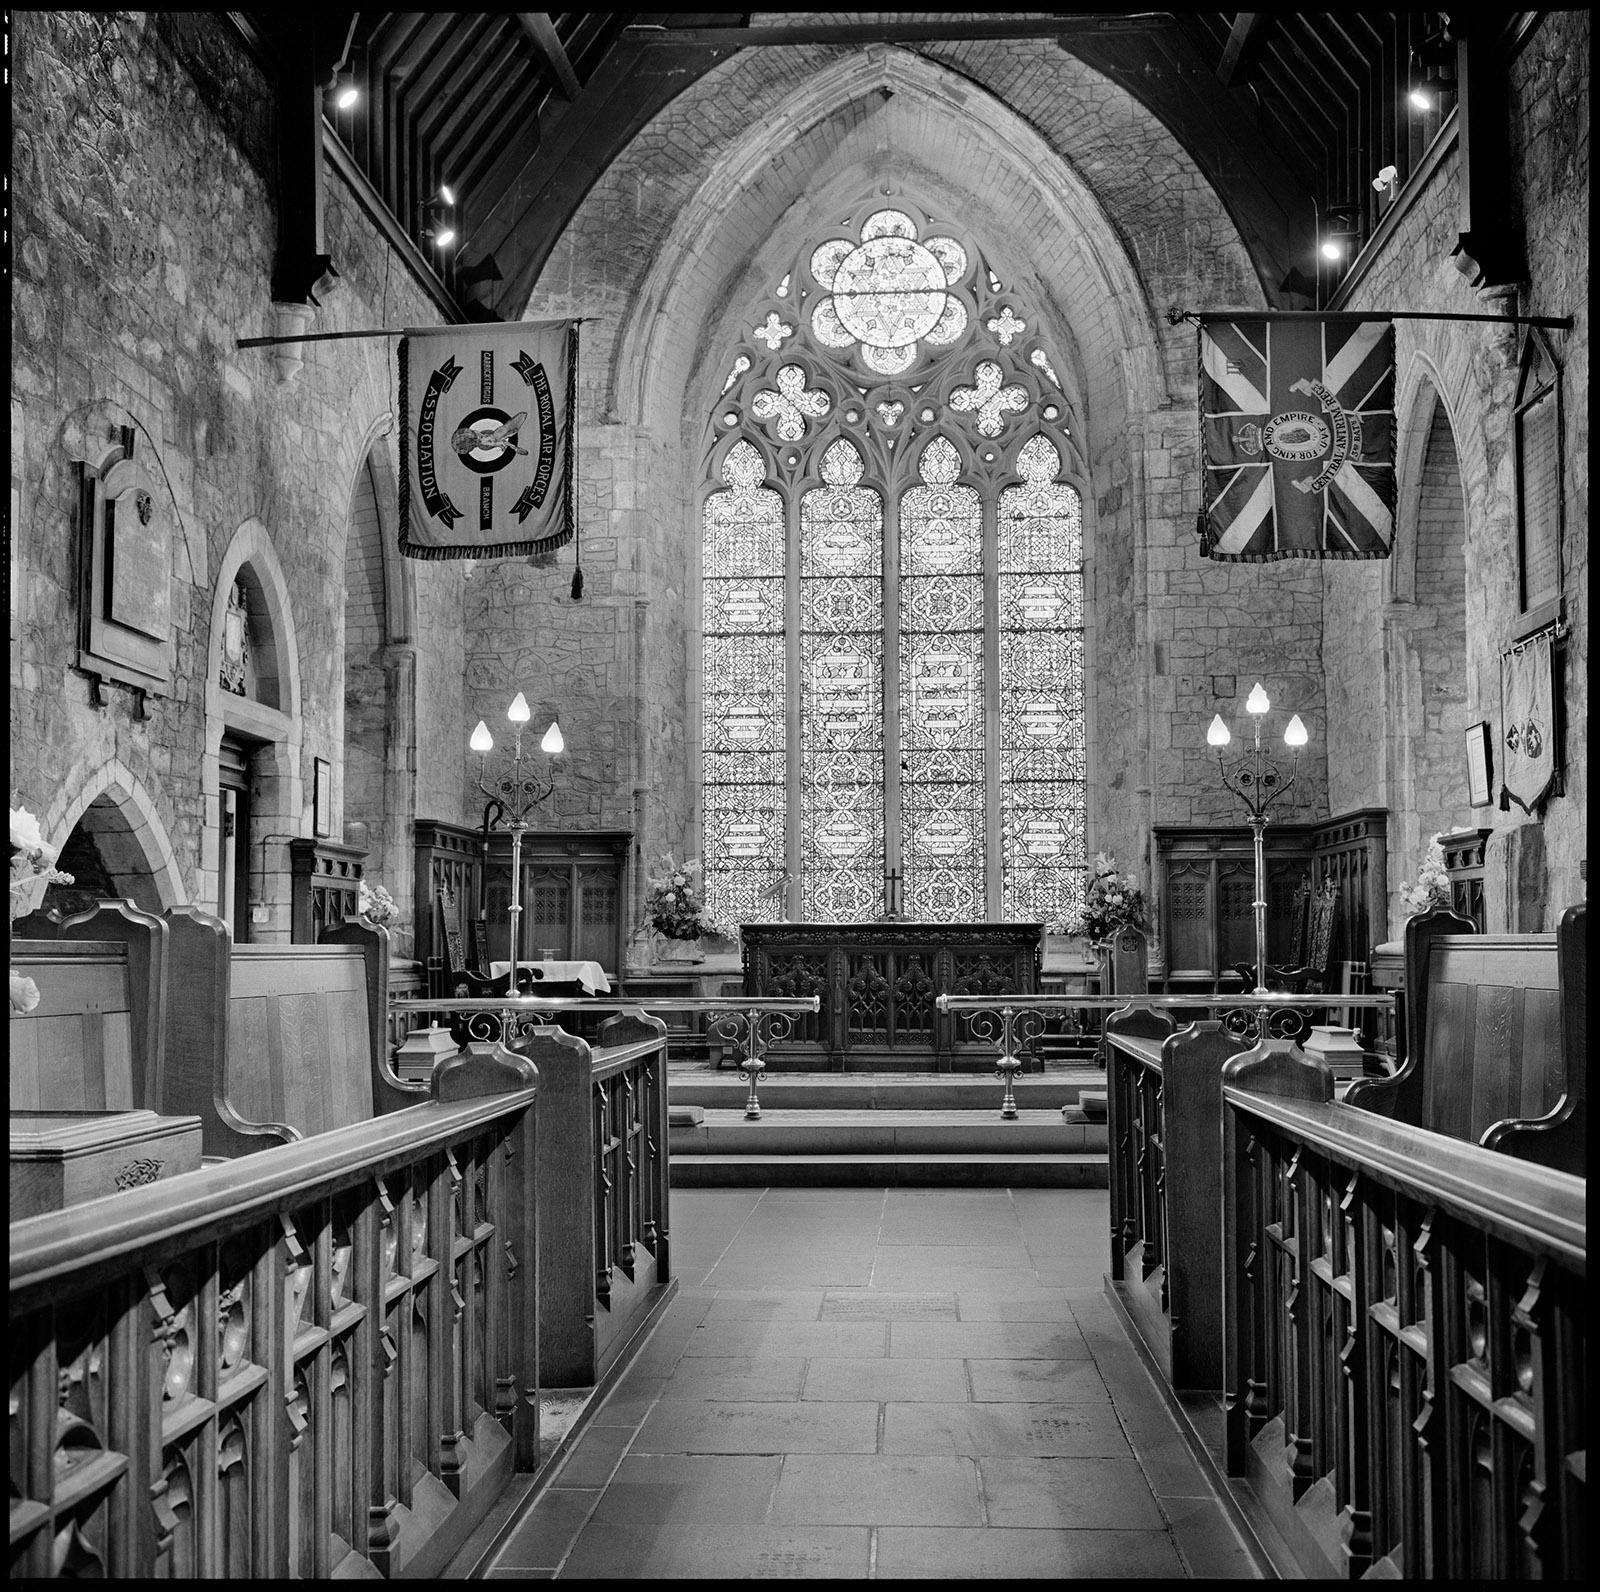 GB. Northern Ireland. Carrickfergus. 2019. St Nicholas's Anglican Church.